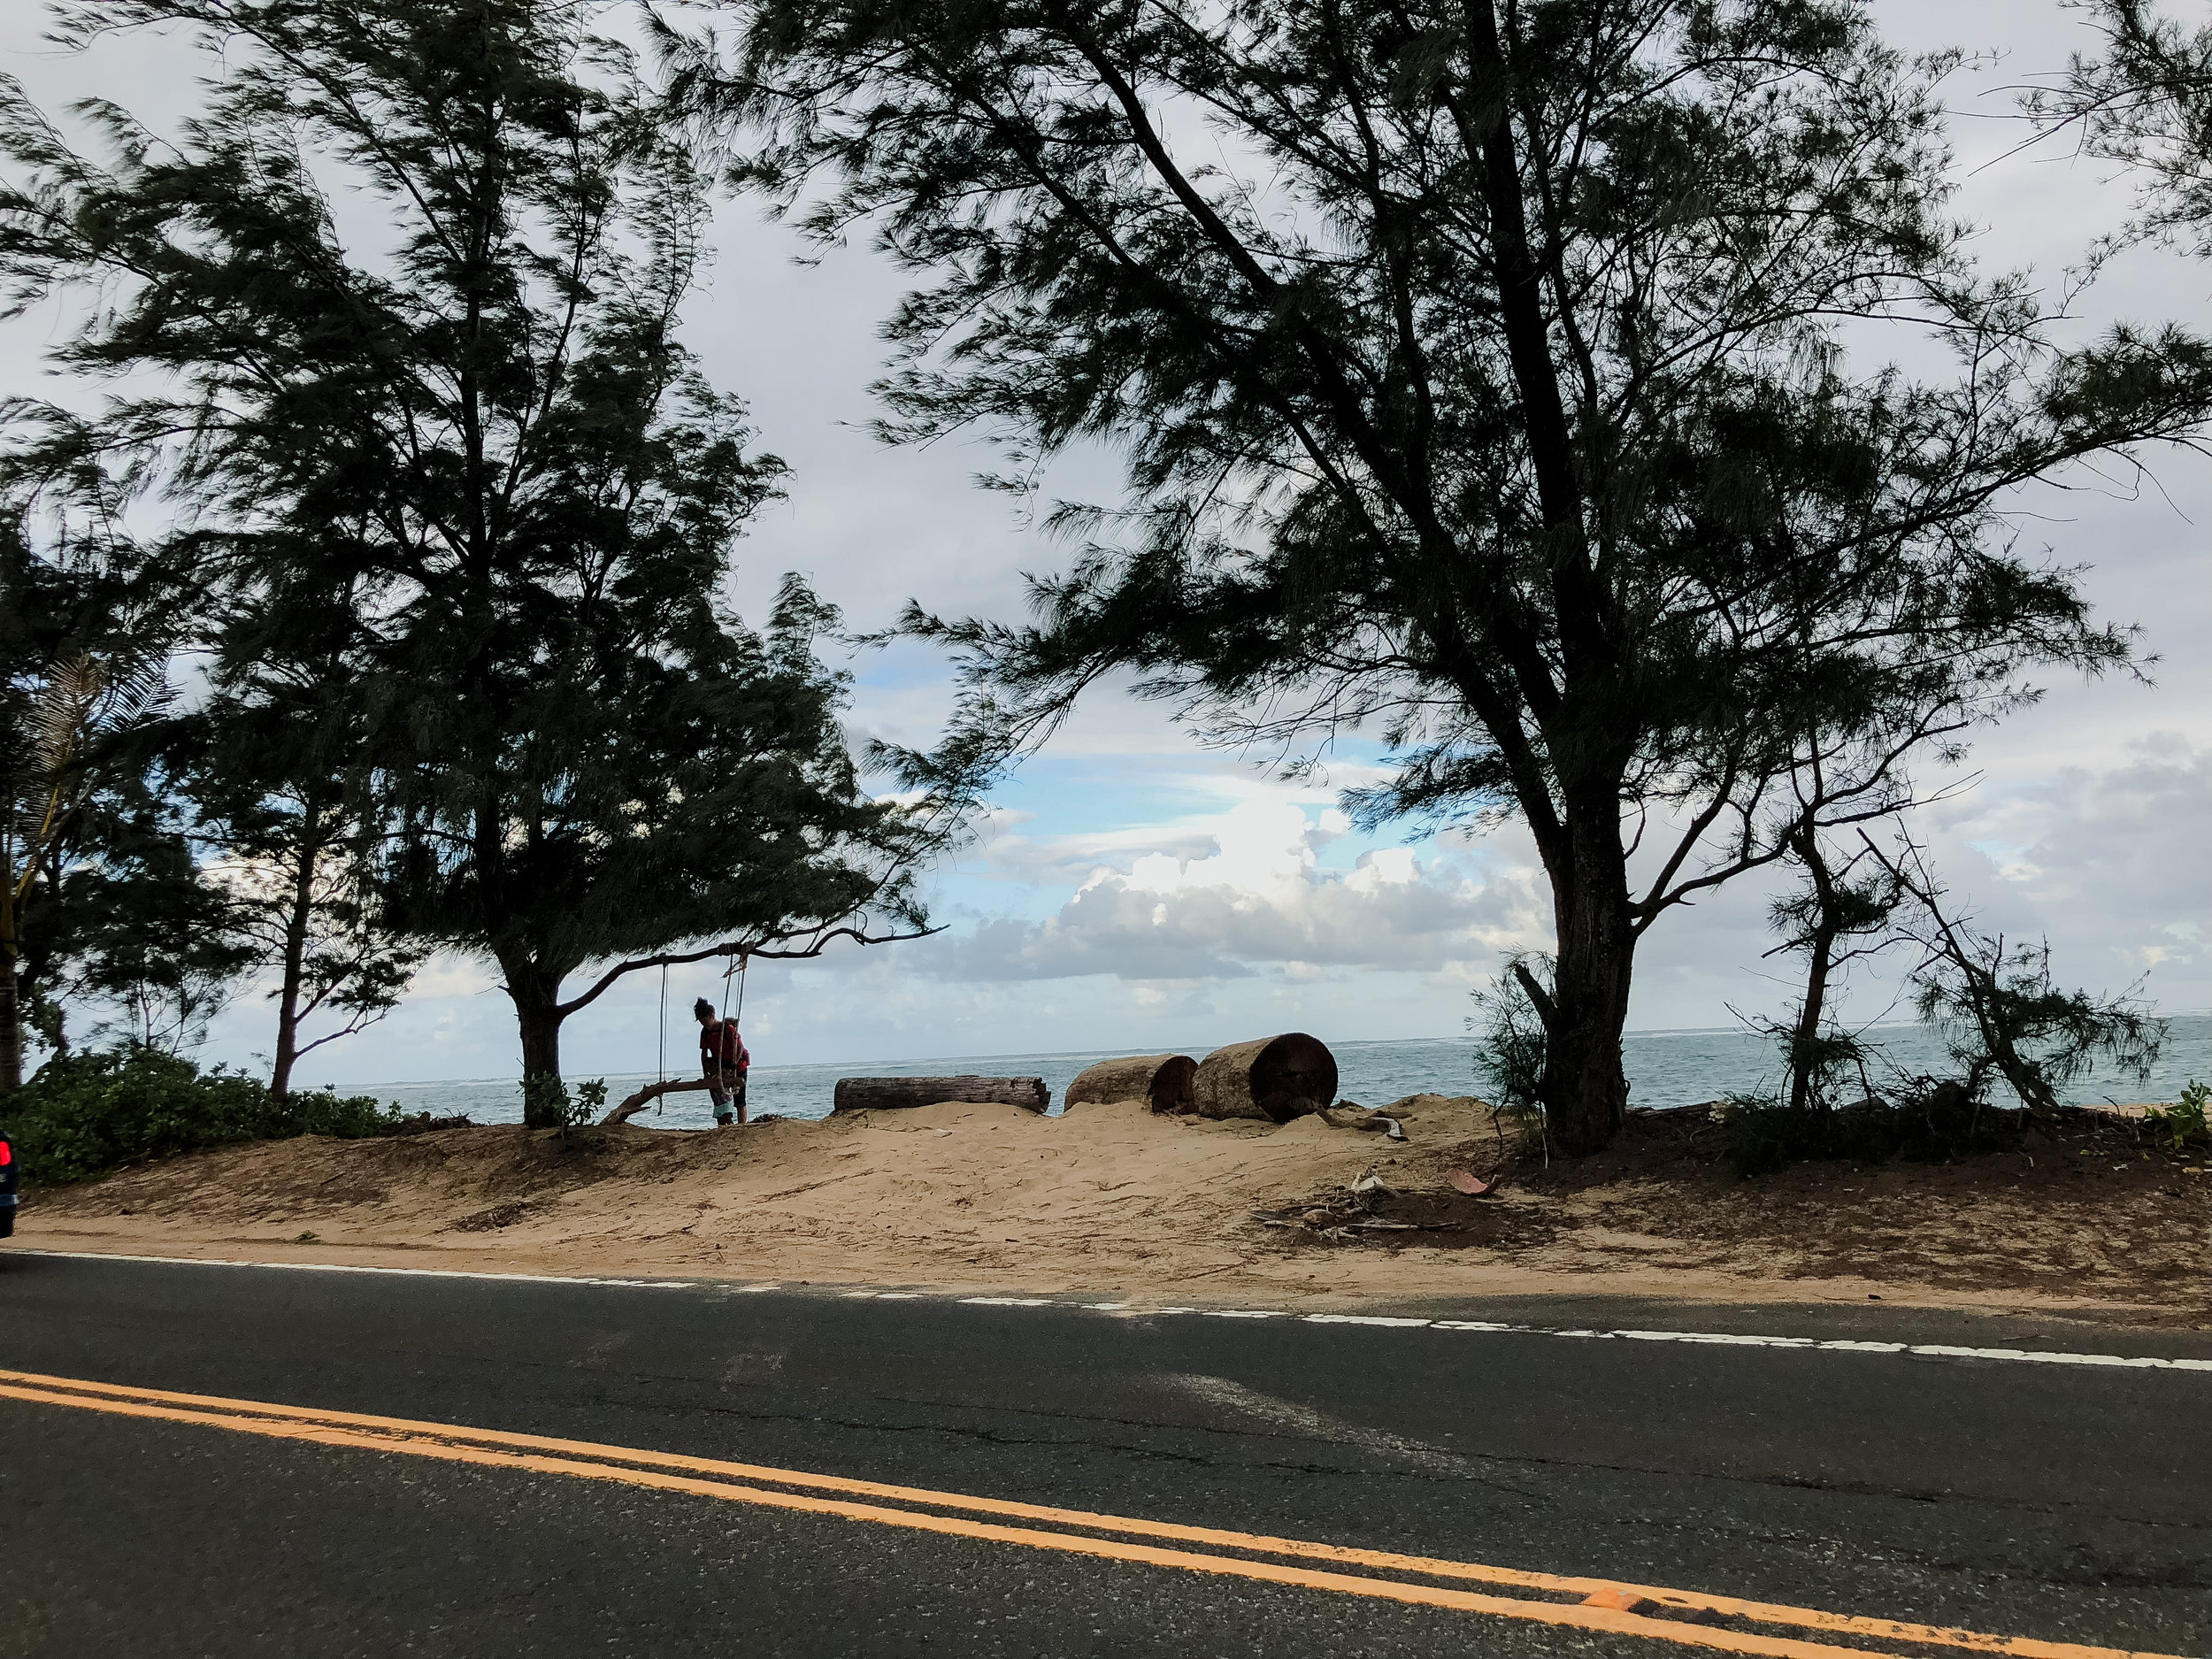 meagans hawaii pics-13.jpg